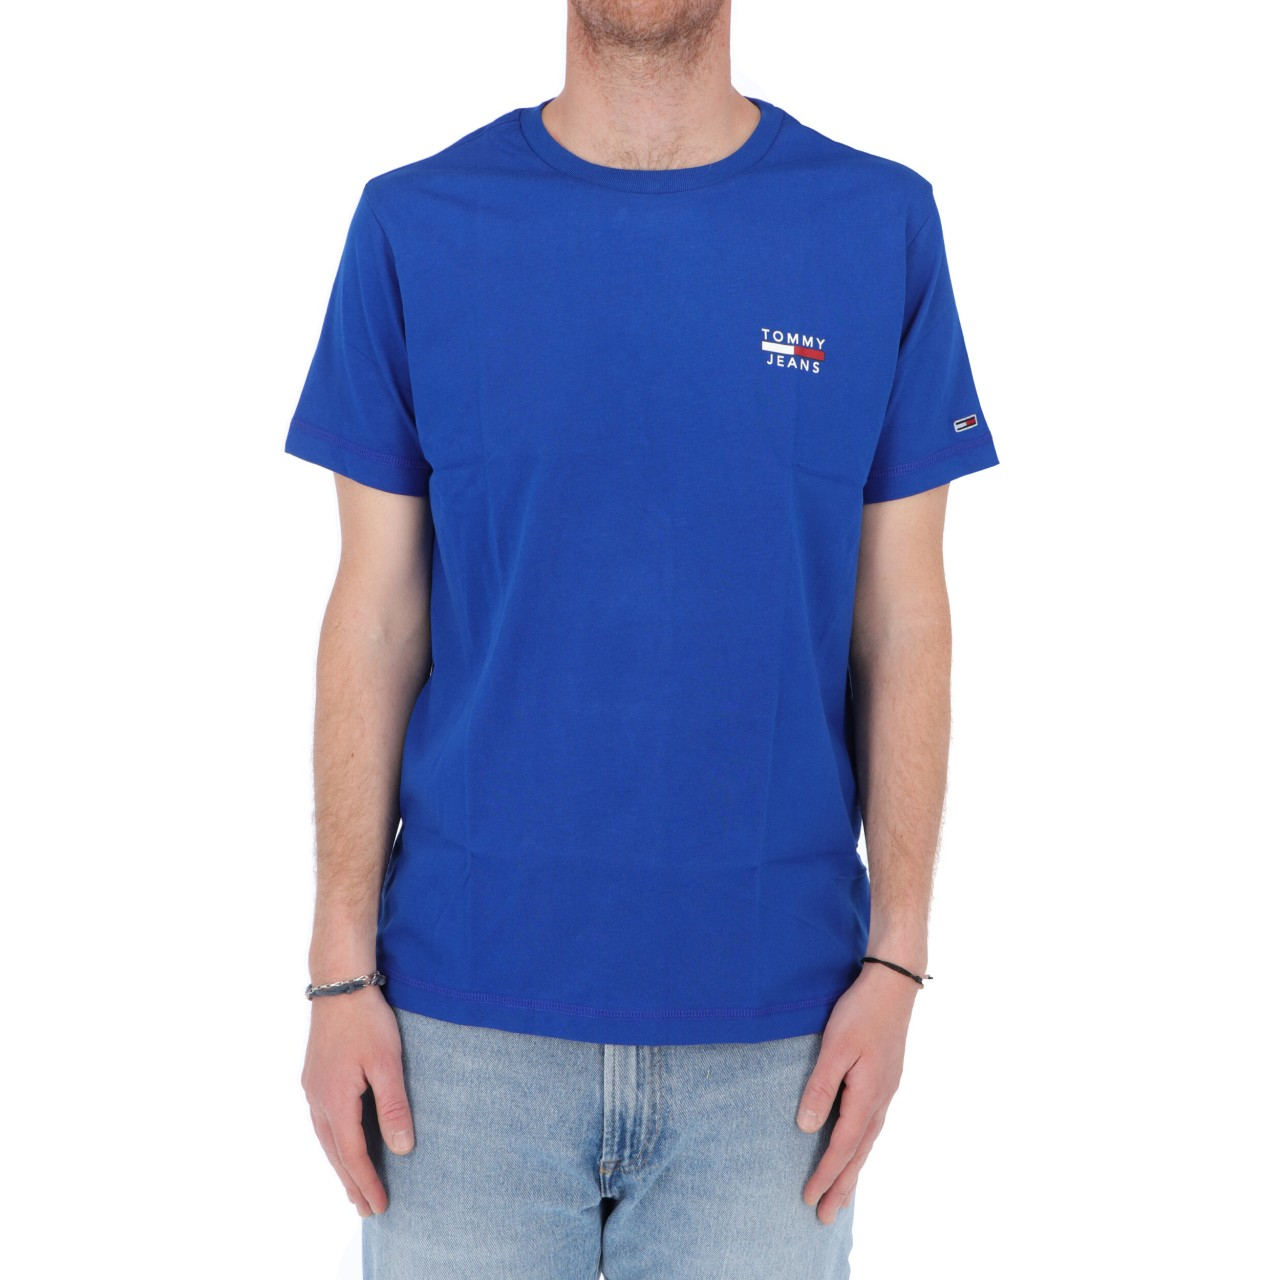 Tommy hilfiger Uomo Tshirt Tommy Hilfiger Jeans Uomo Chest Logo Tee 10099P